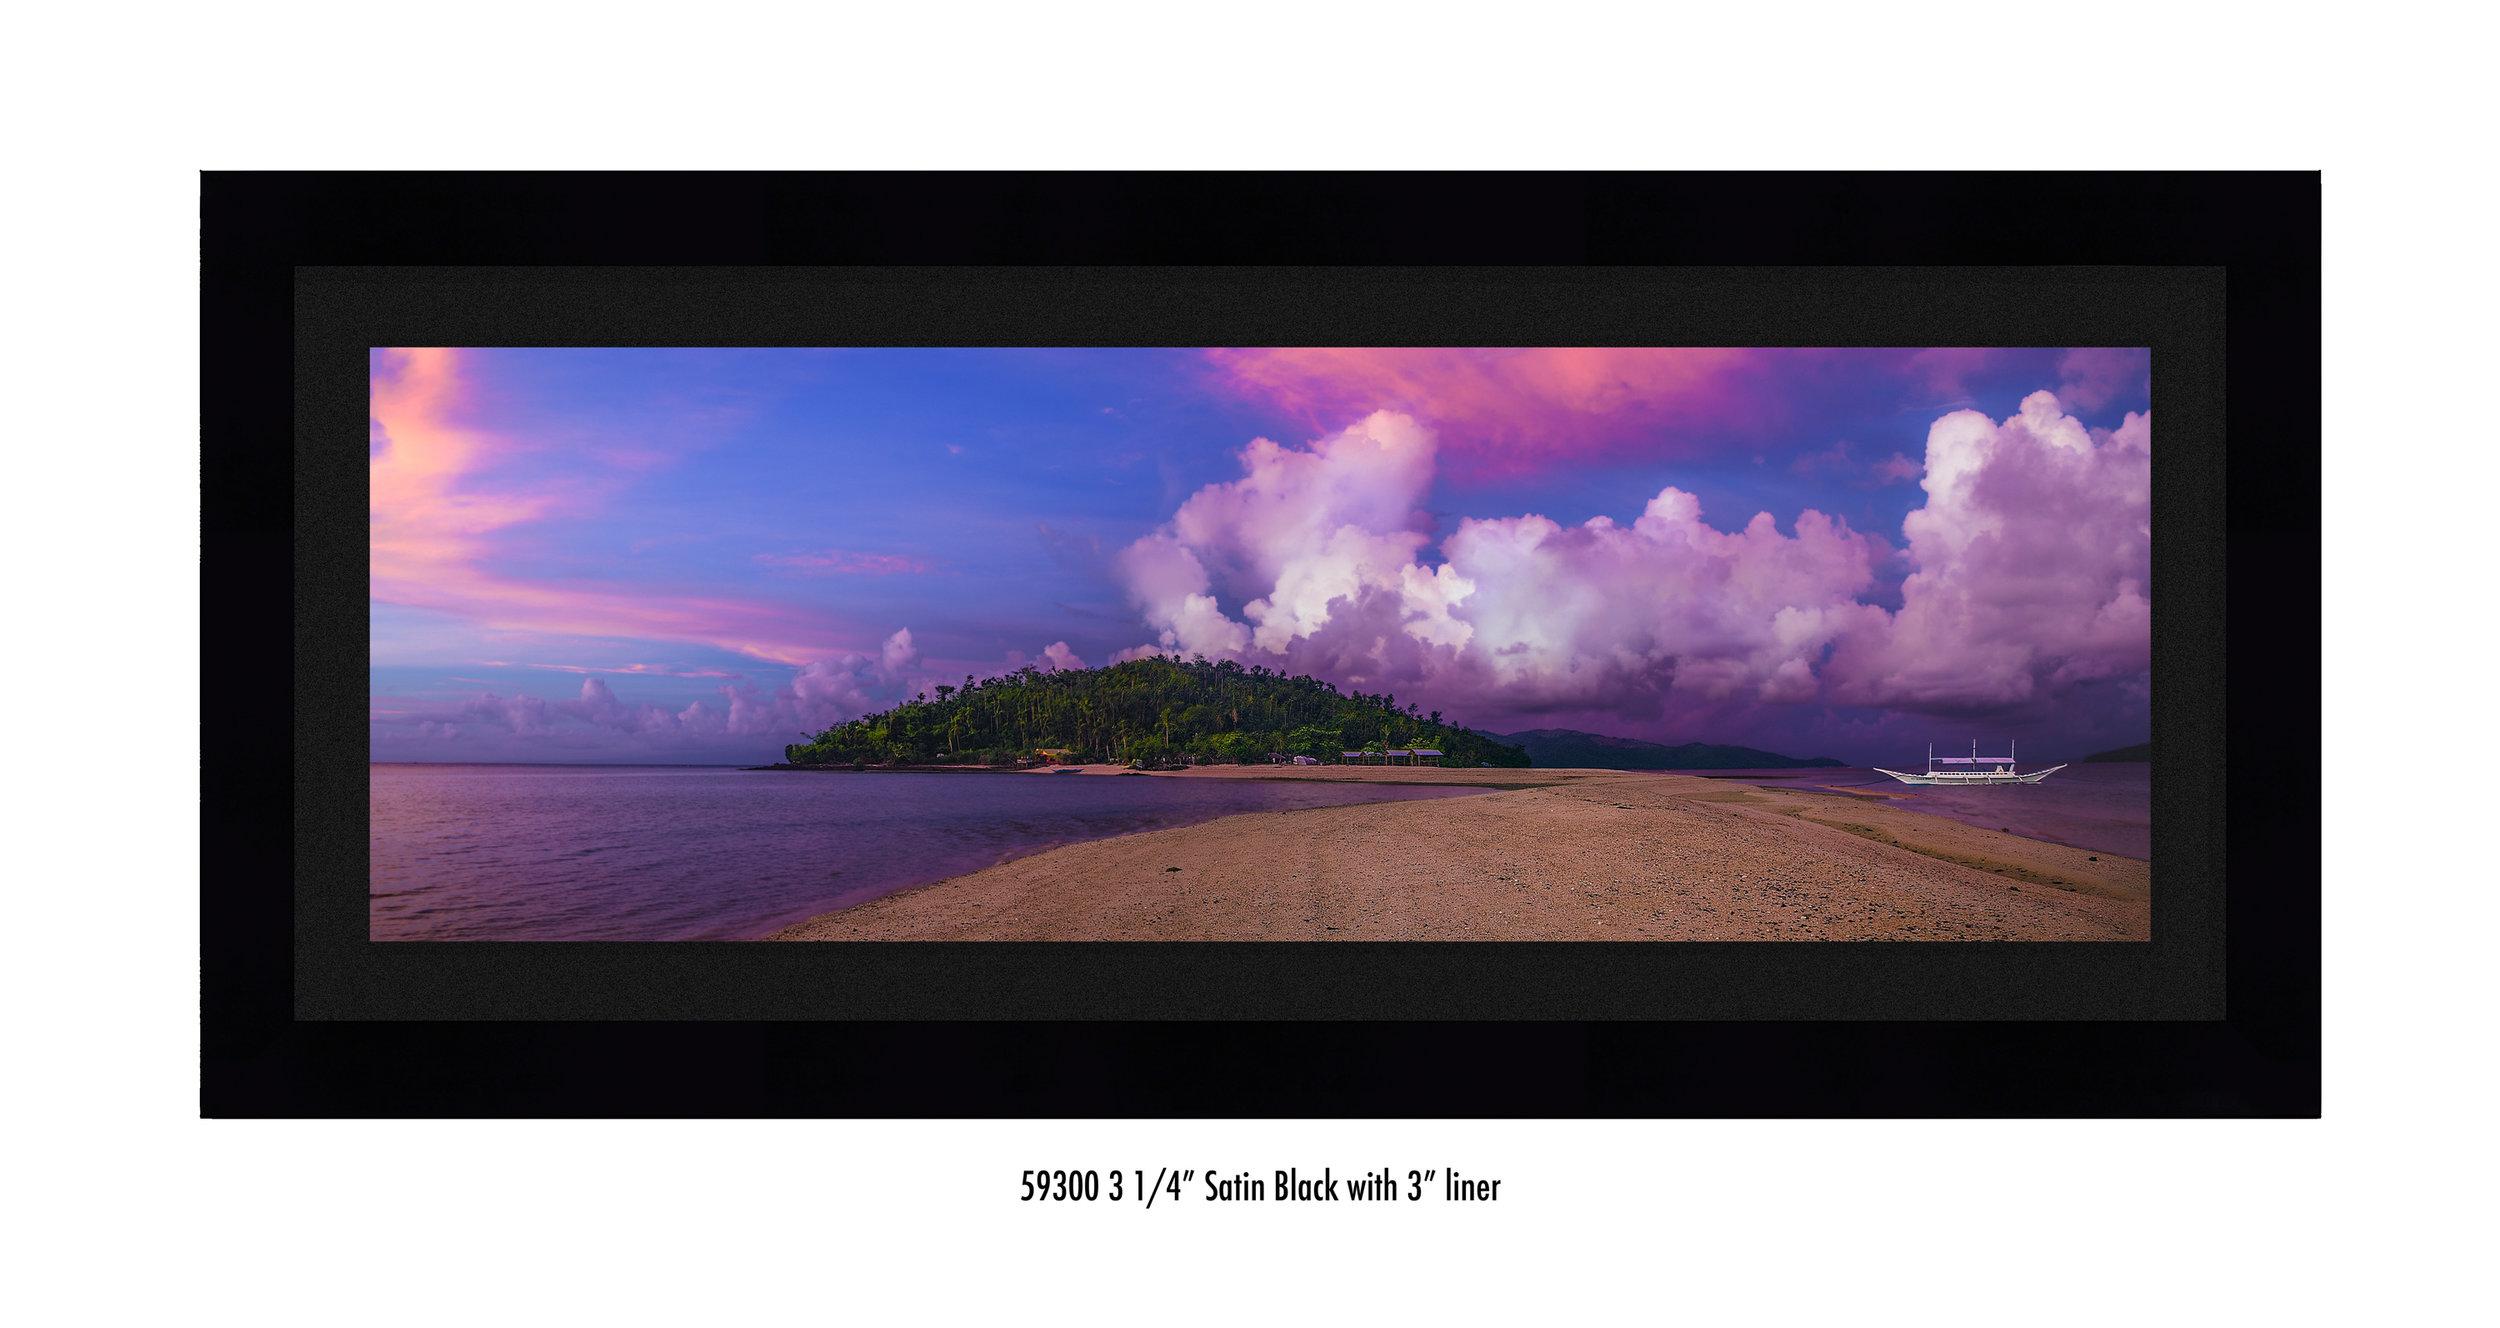 Sand-Bar-Isle-59300-blk.jpg